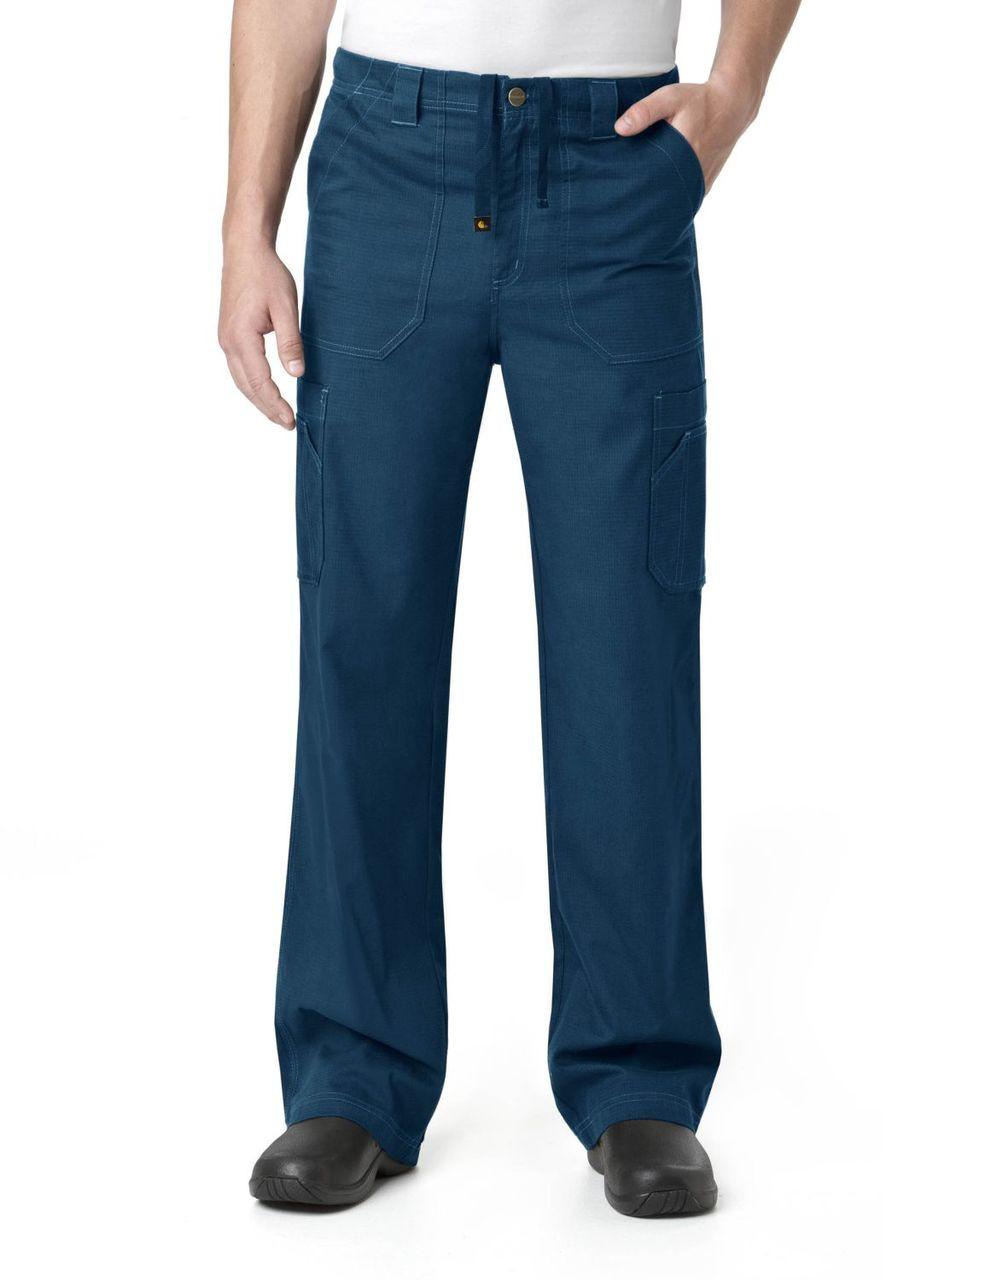 (C54108T) Carhartt Men's Ripstop Scrubs - Mens Multi-Cargo Pant (Tall)